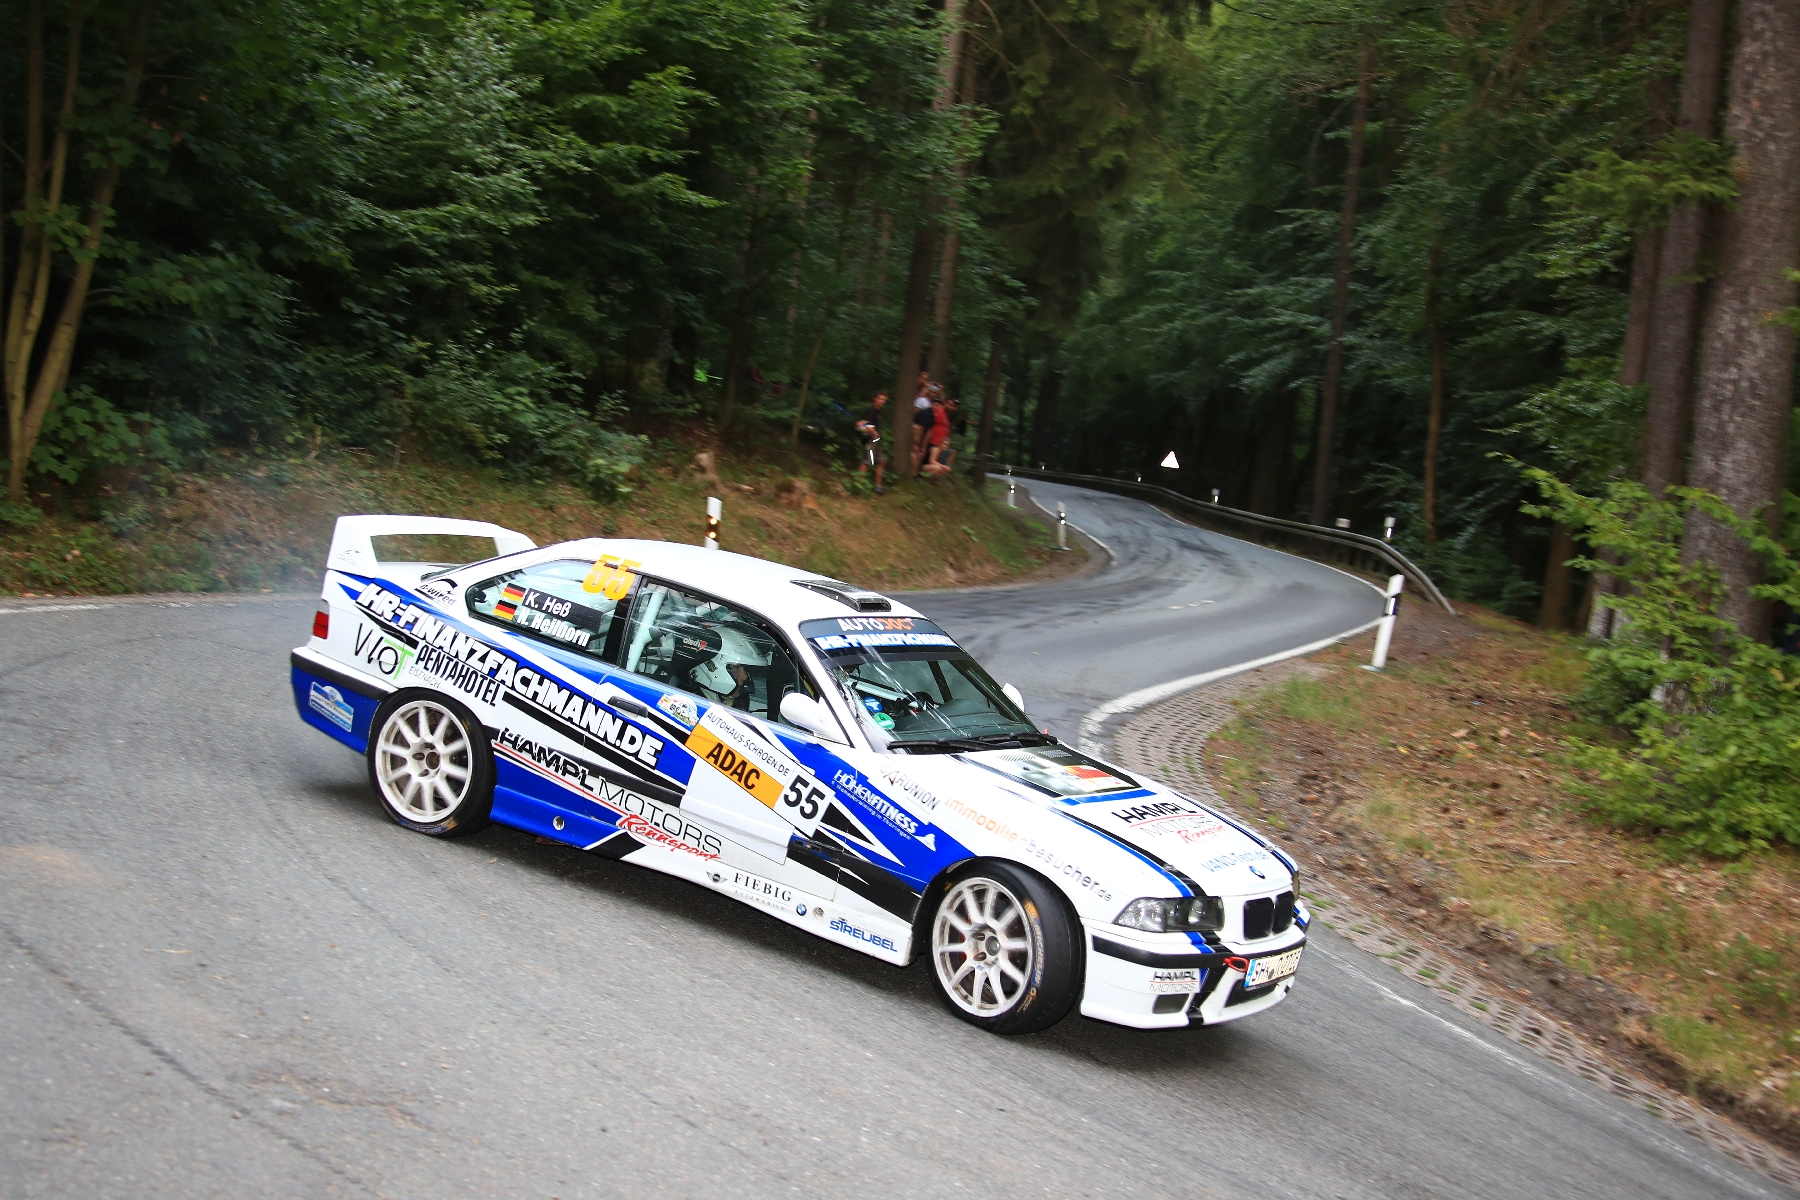 Wartburg-Rallye 2018 Nick Heilborn - Benjamin Melde BMW M3